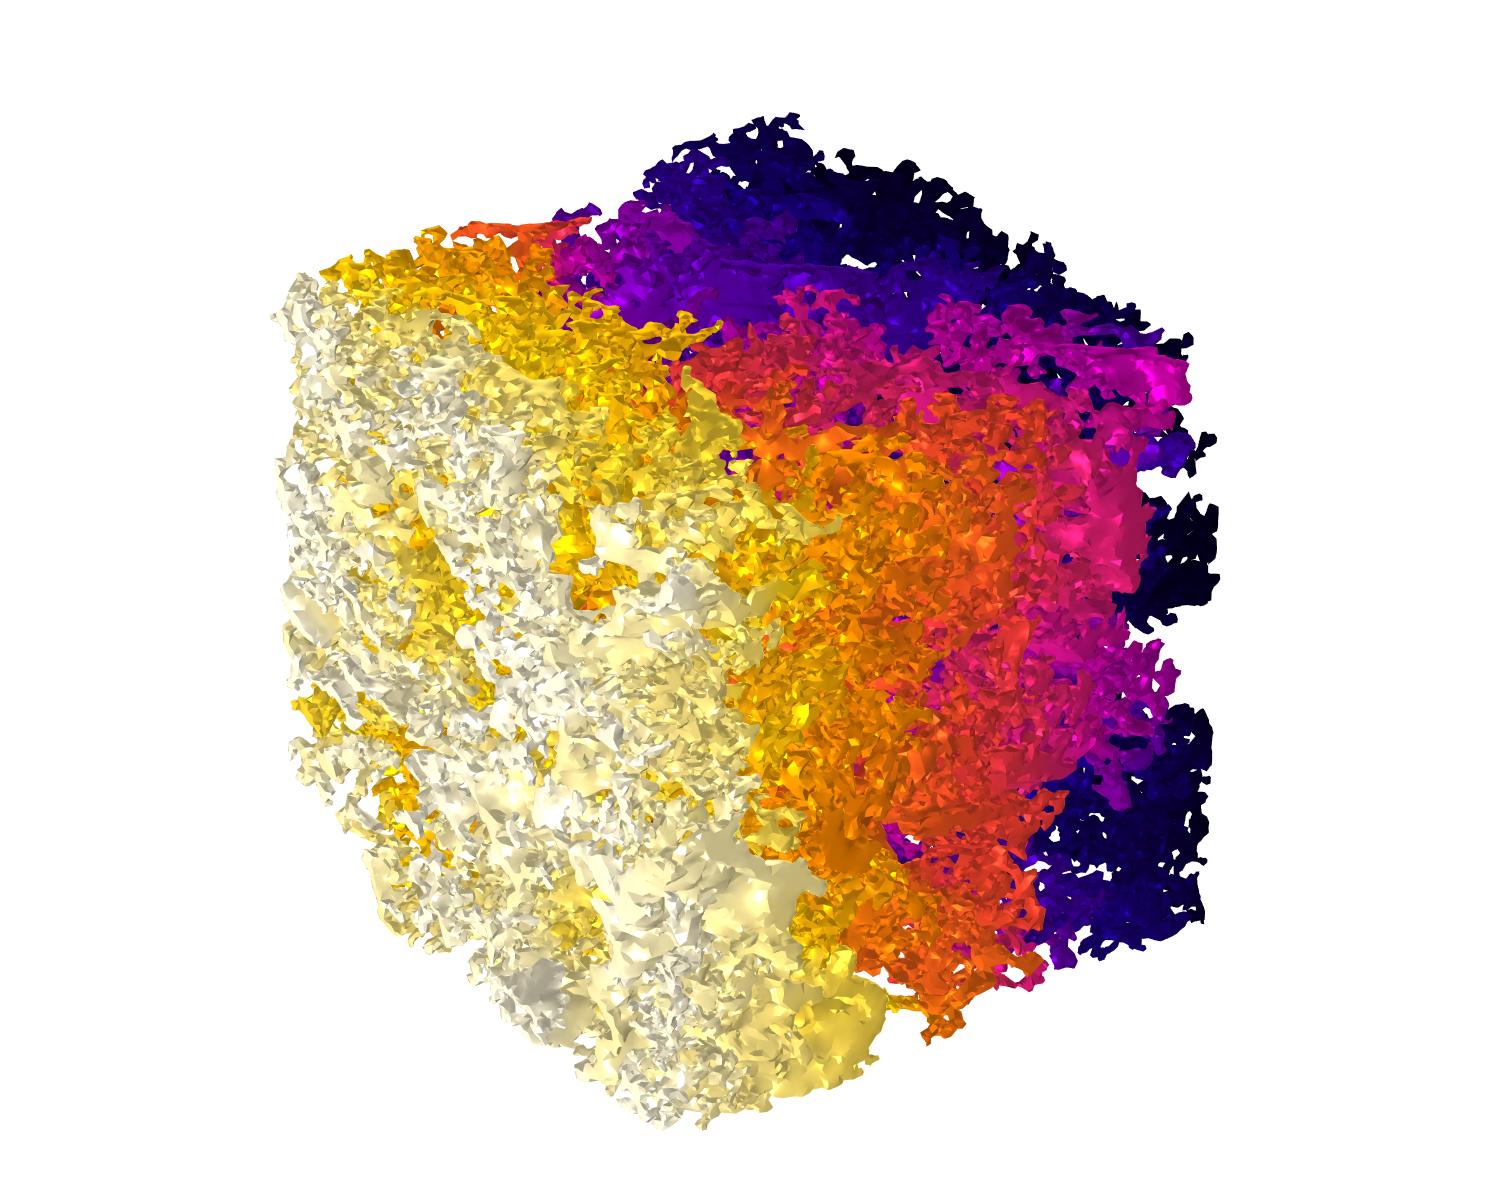 A multiphysics model showing pore-scale flow.